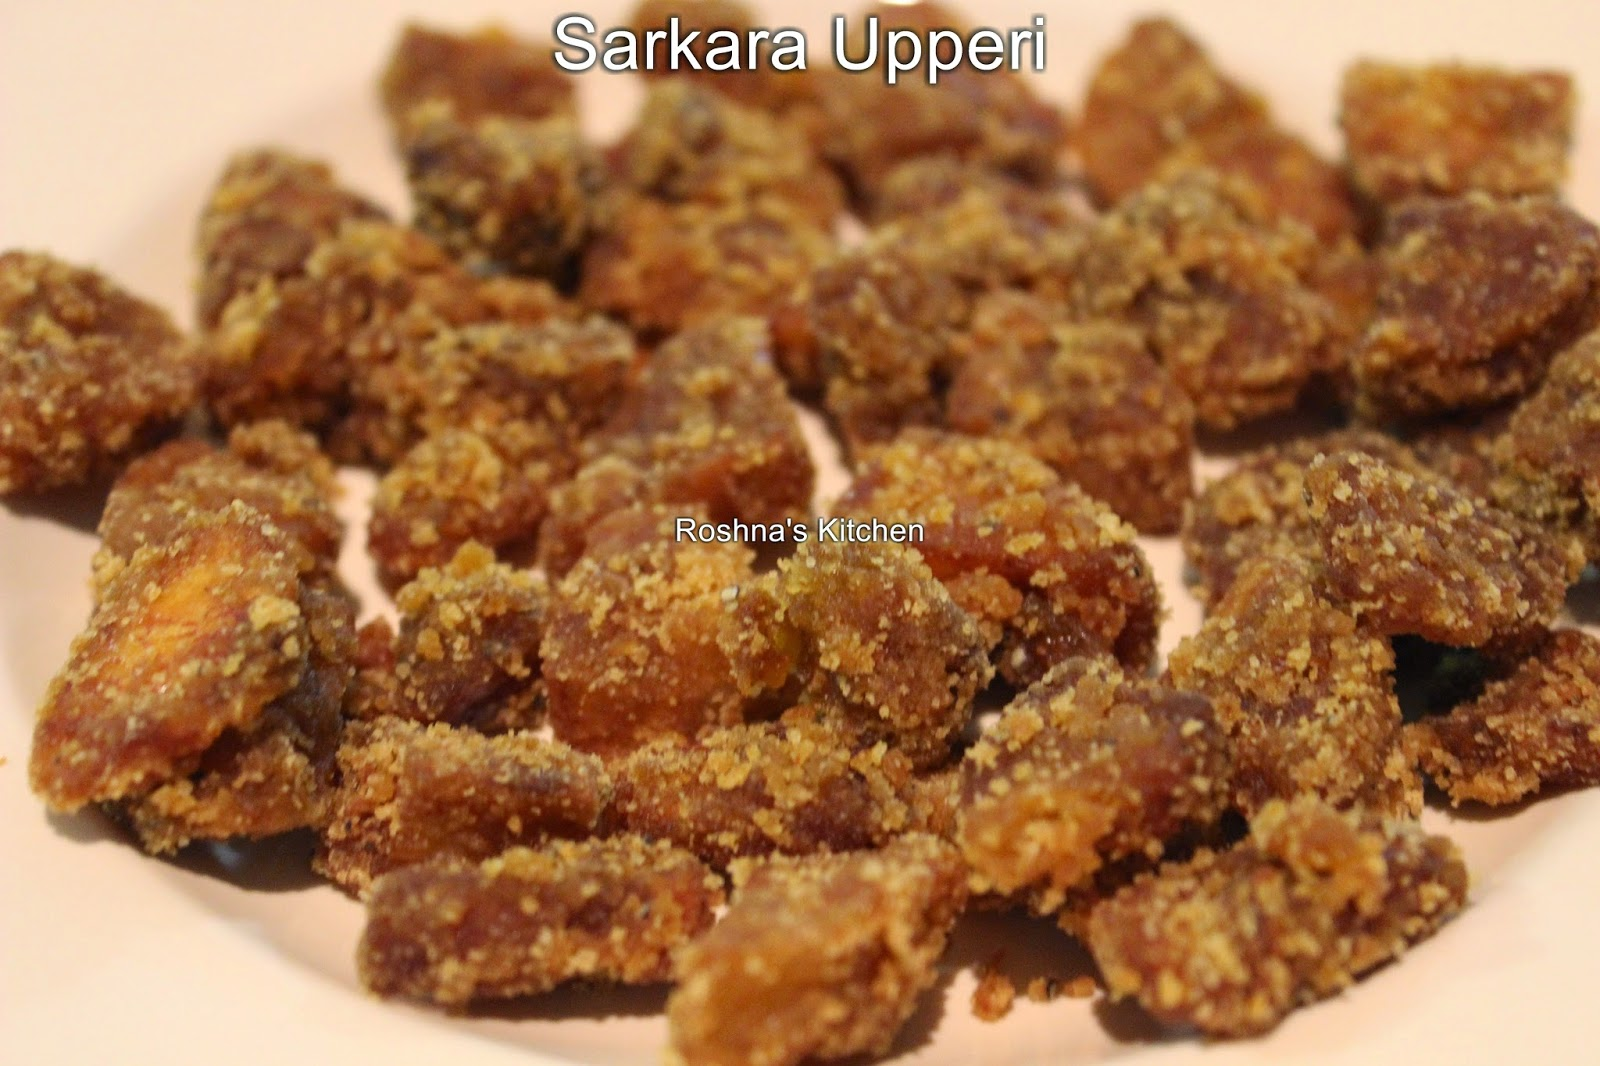 Sarkara Varatti/Sarkara Upperi